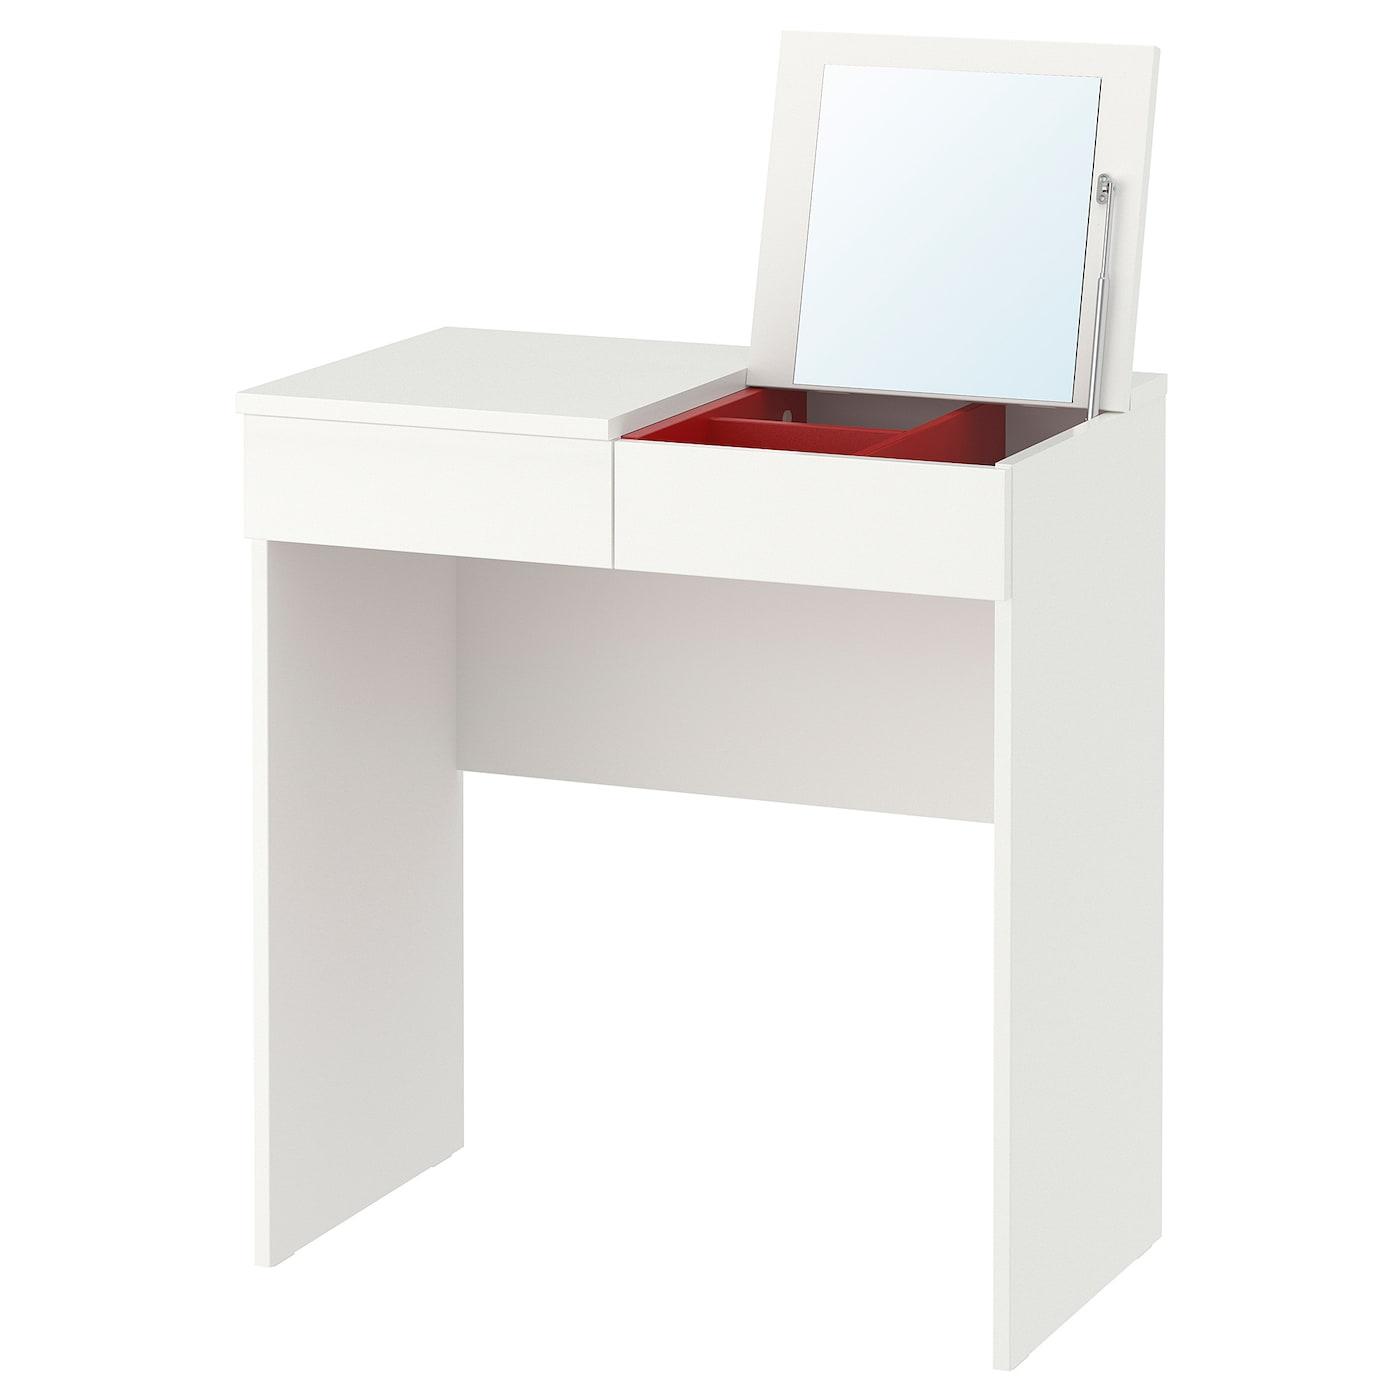 Brimnes Dressing Table White 27 1 2x16 1 2 Ikea